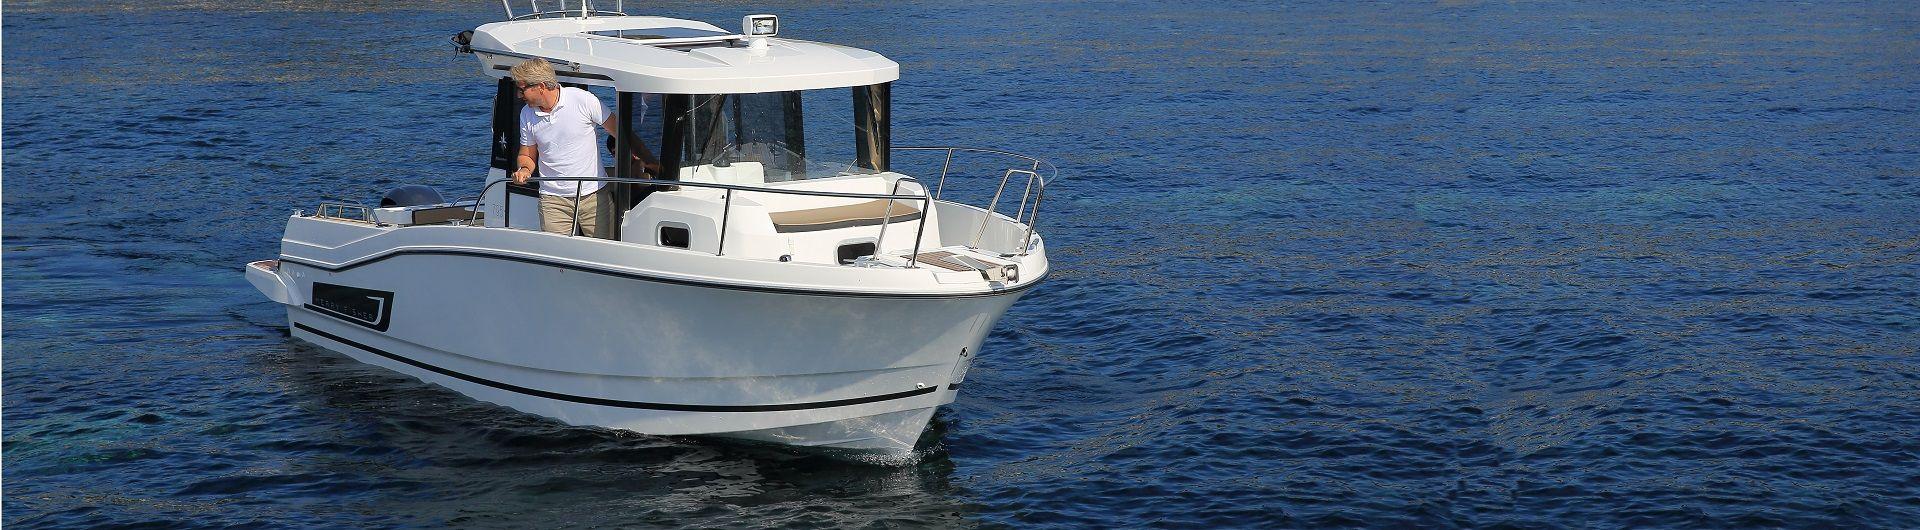 Sportboot Jeanneau Merry Fisher 795 Marlin Header